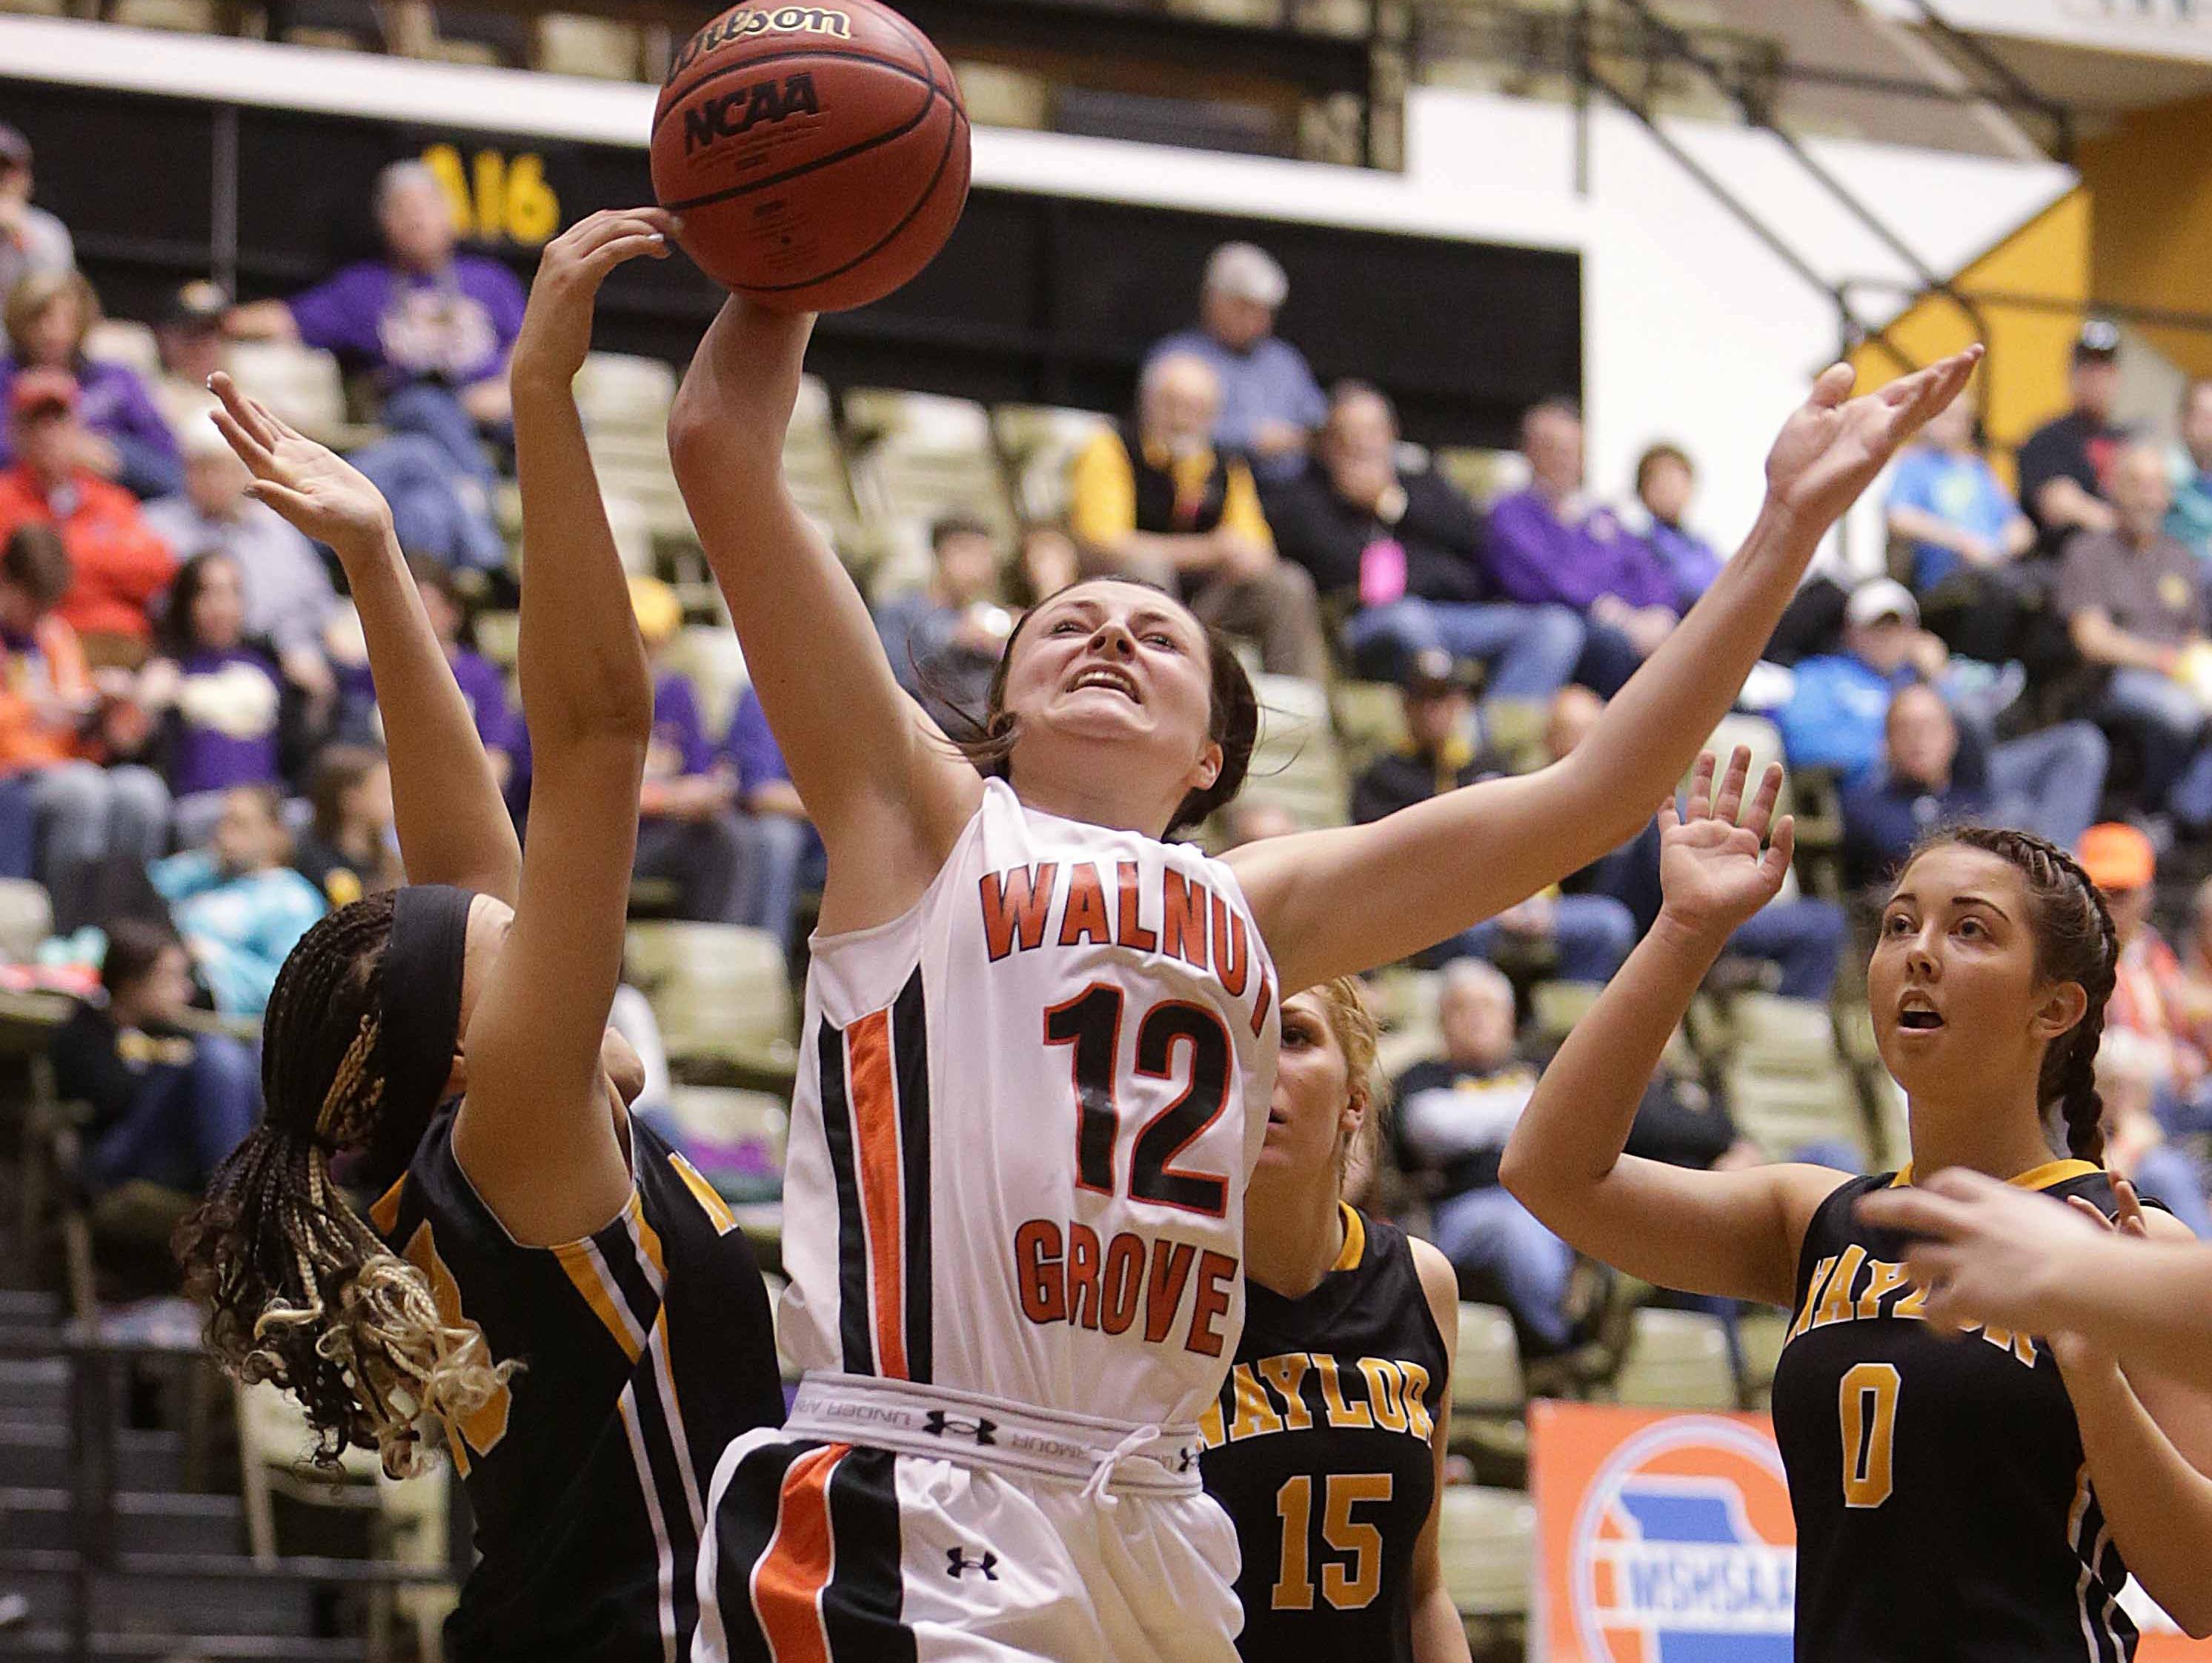 Walnut Grove's Bayley Harman (12) drives to the basket.